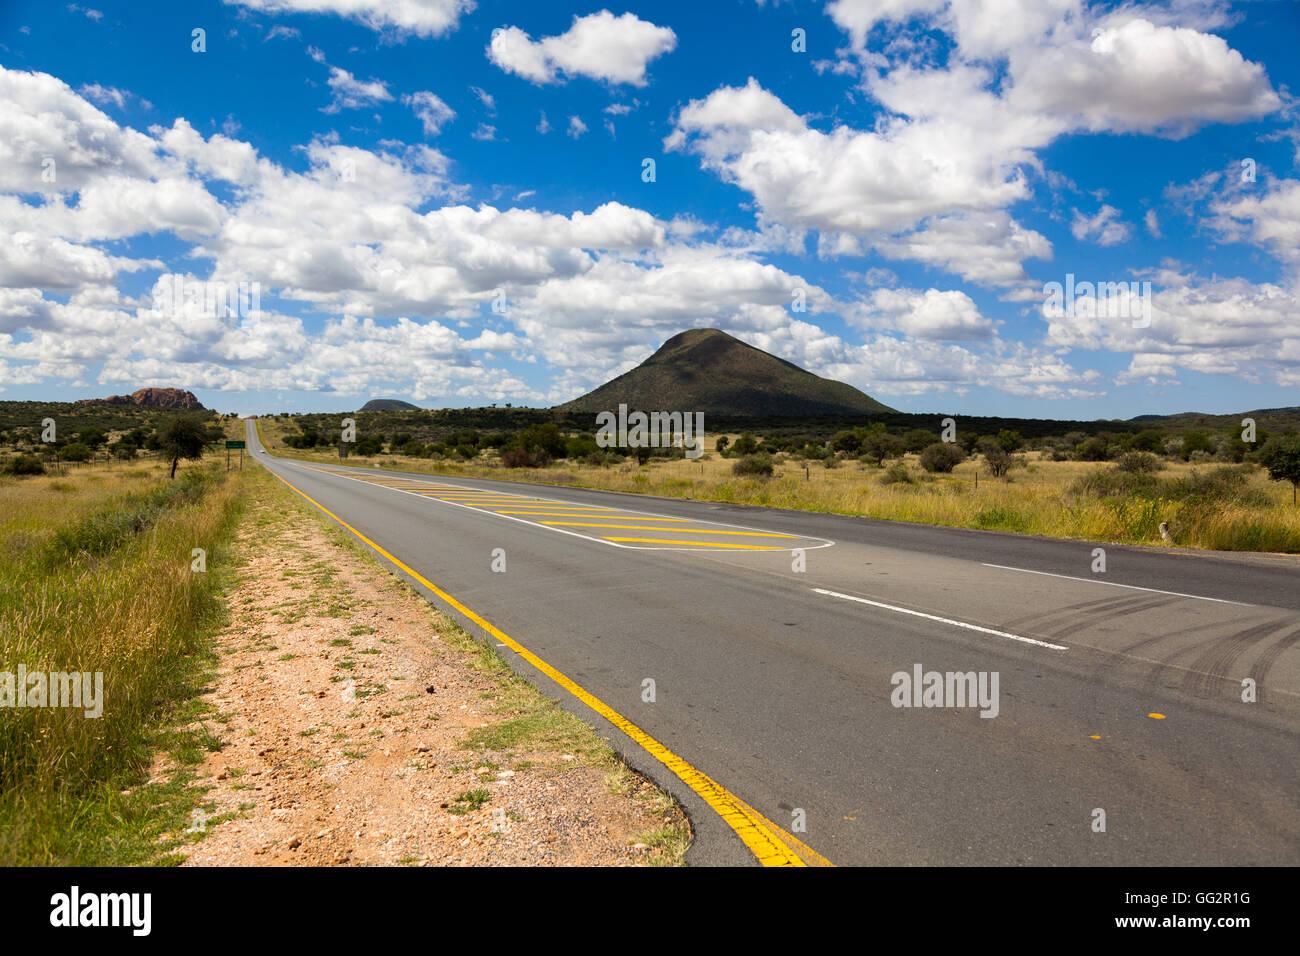 Namibia Highway B1, South of Windhoek - Stock Image